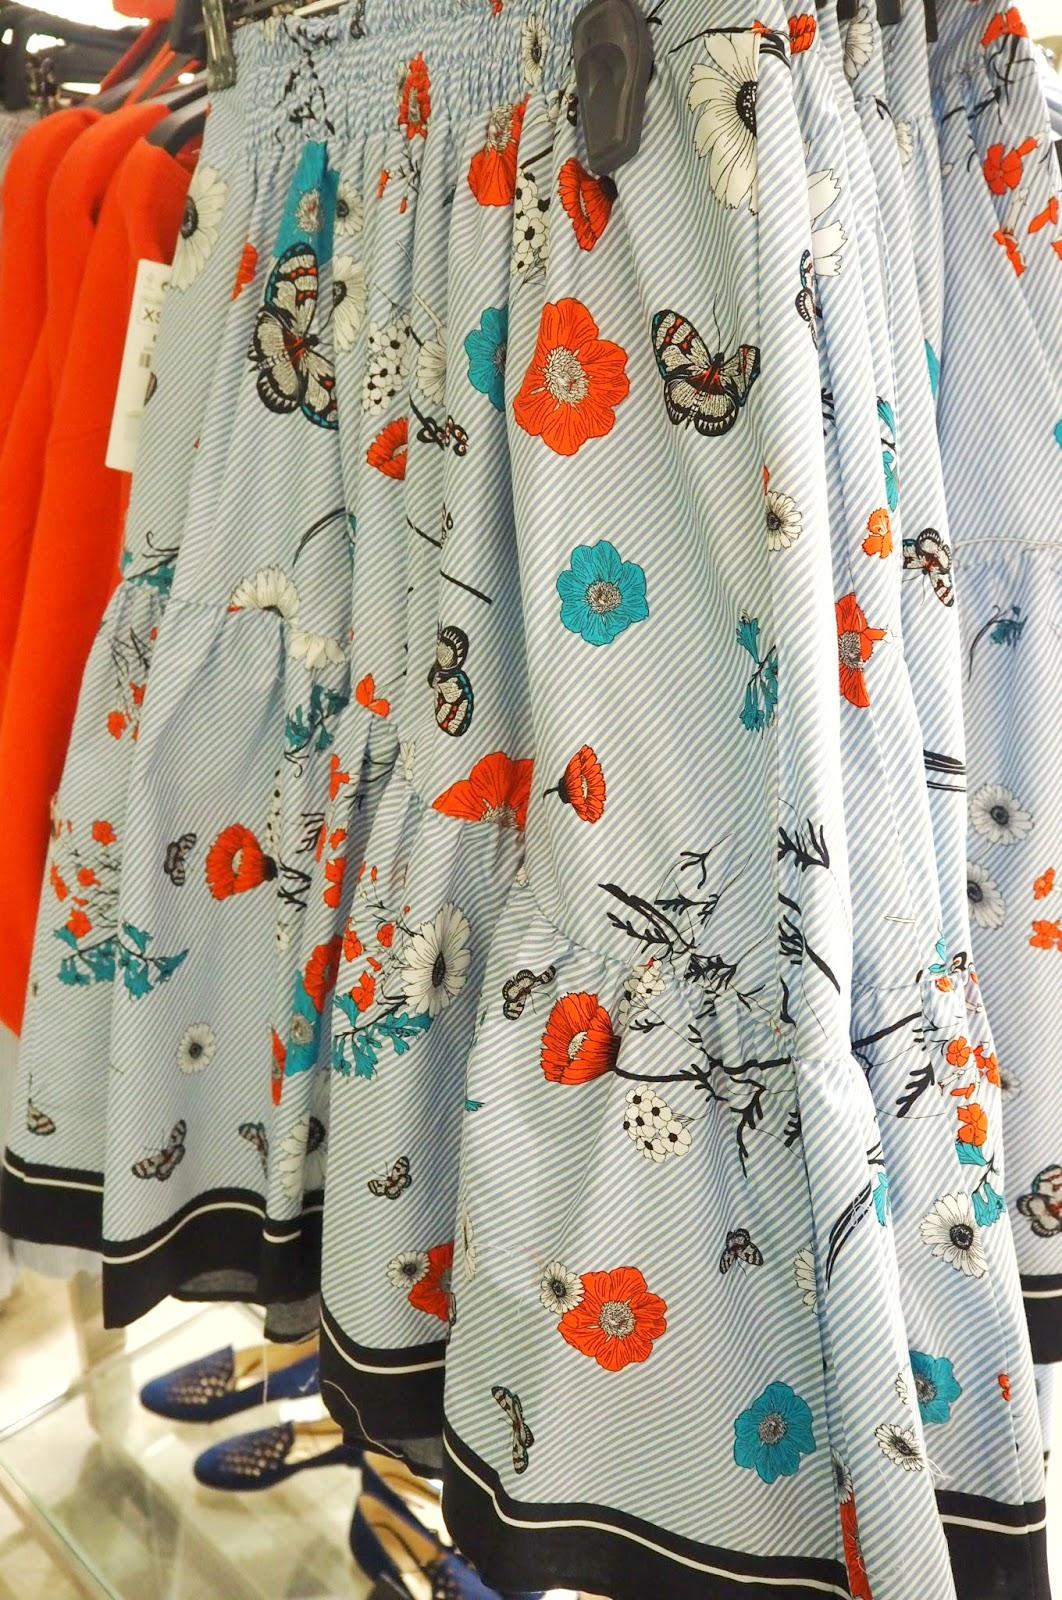 Zara - Stripe and flowers skirt